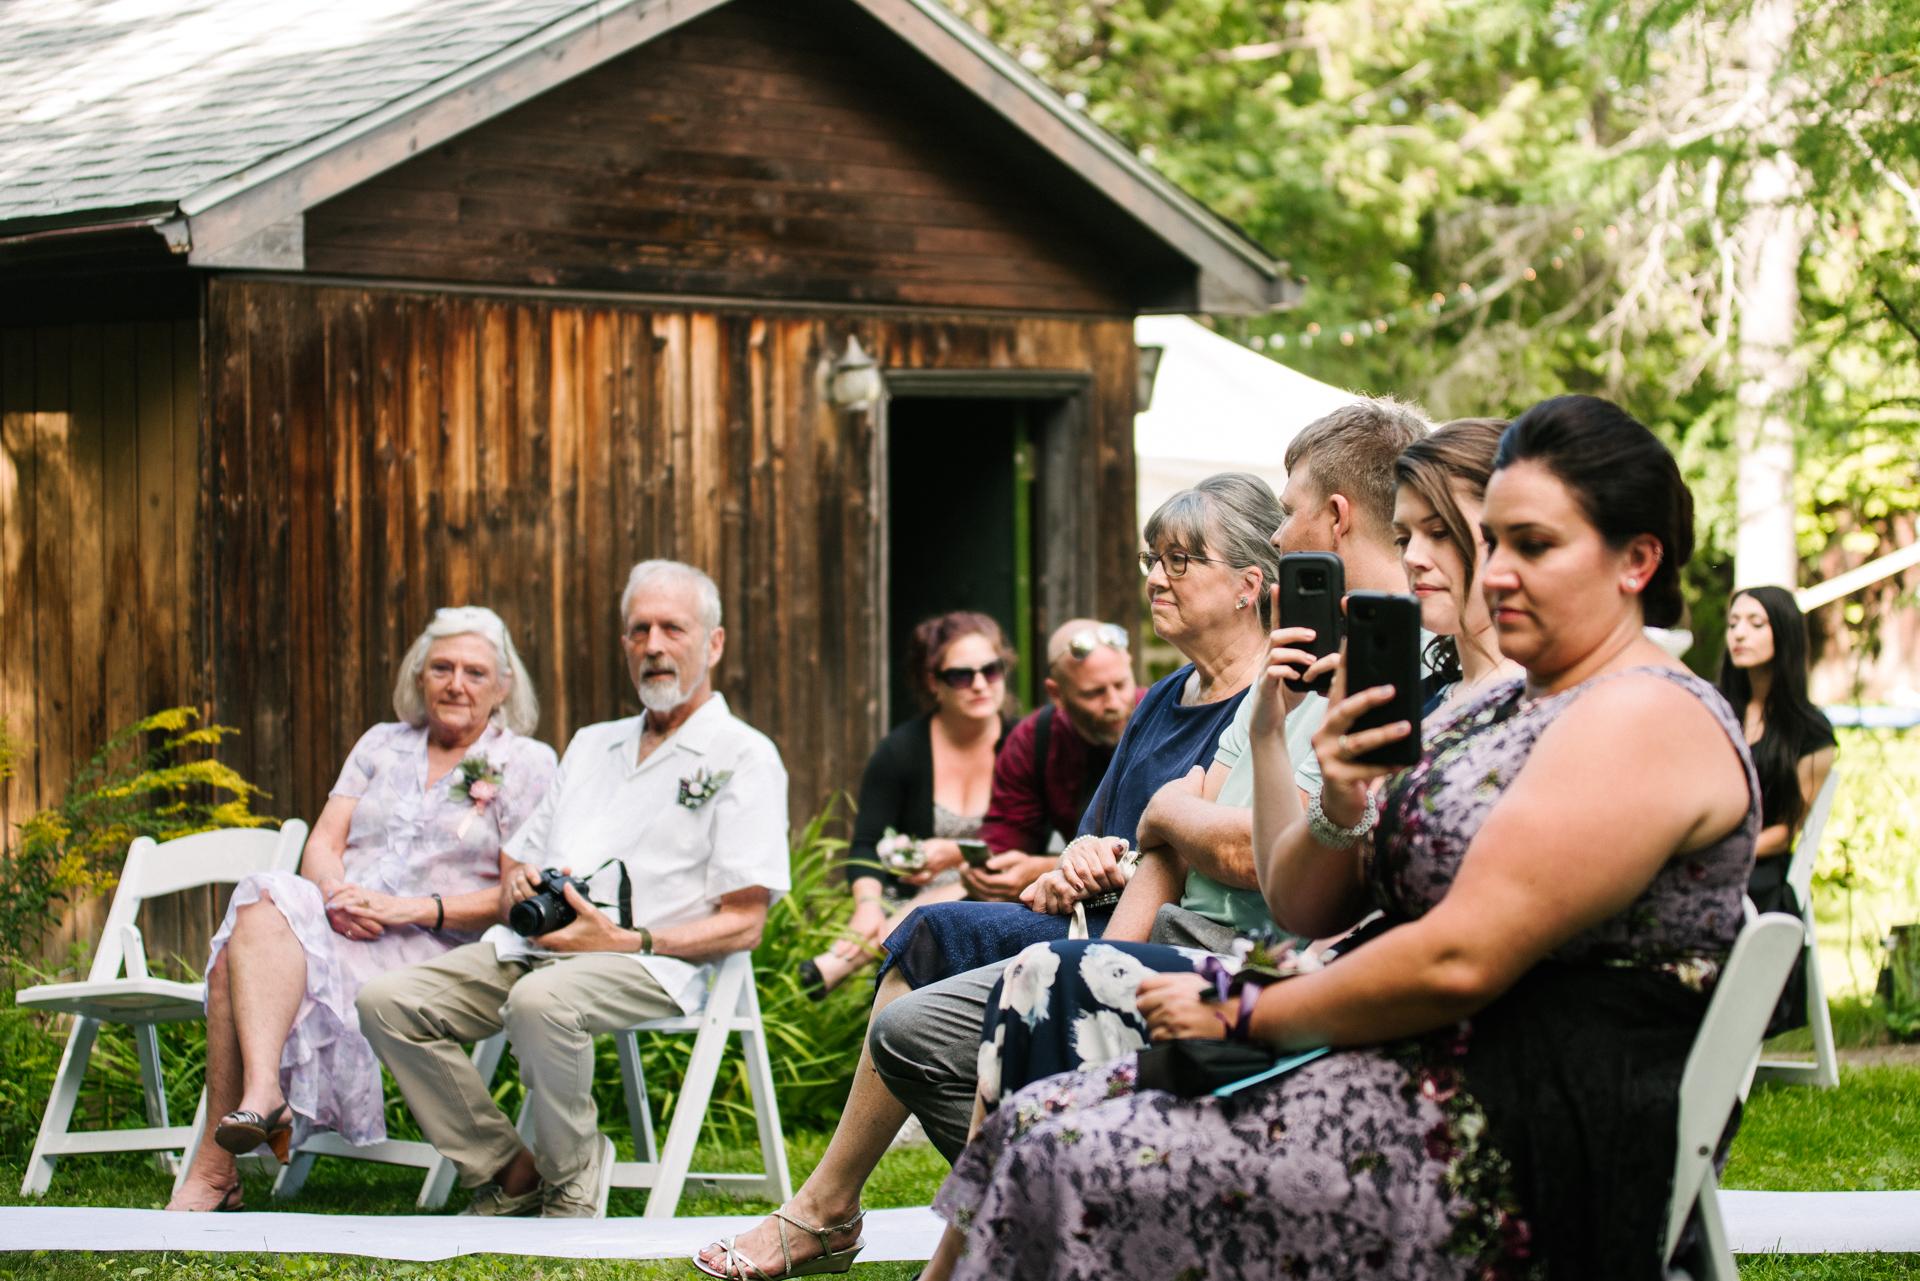 Kanata, Ottawa, Outdoor Ceremony Wedding Image | The guests witness the backyard ceremony